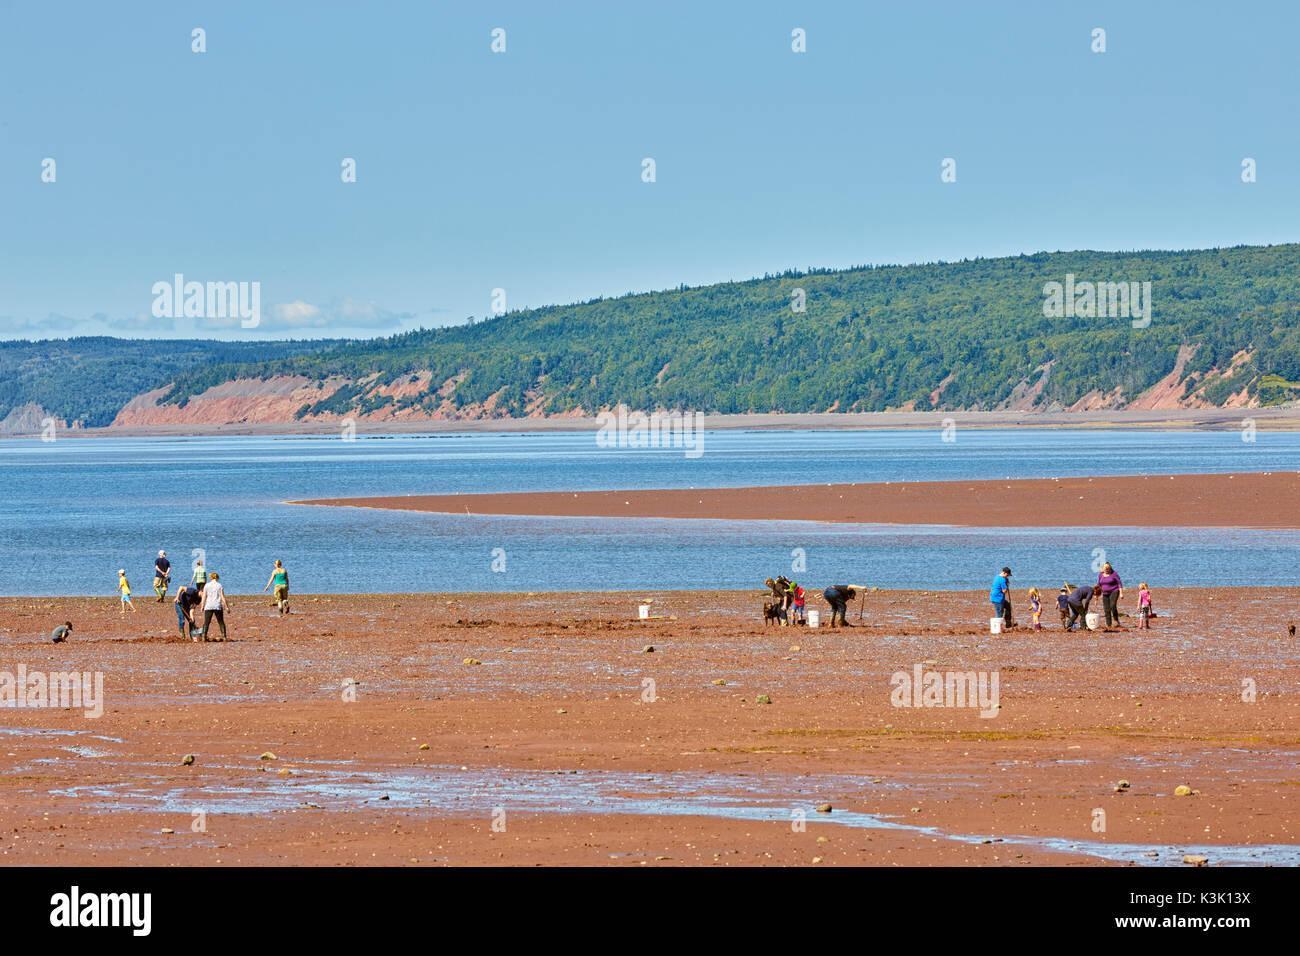 Clam digging at Five Islands Provincial Park, Bay of Fundy, Nova Scotia, Canada - Stock Image